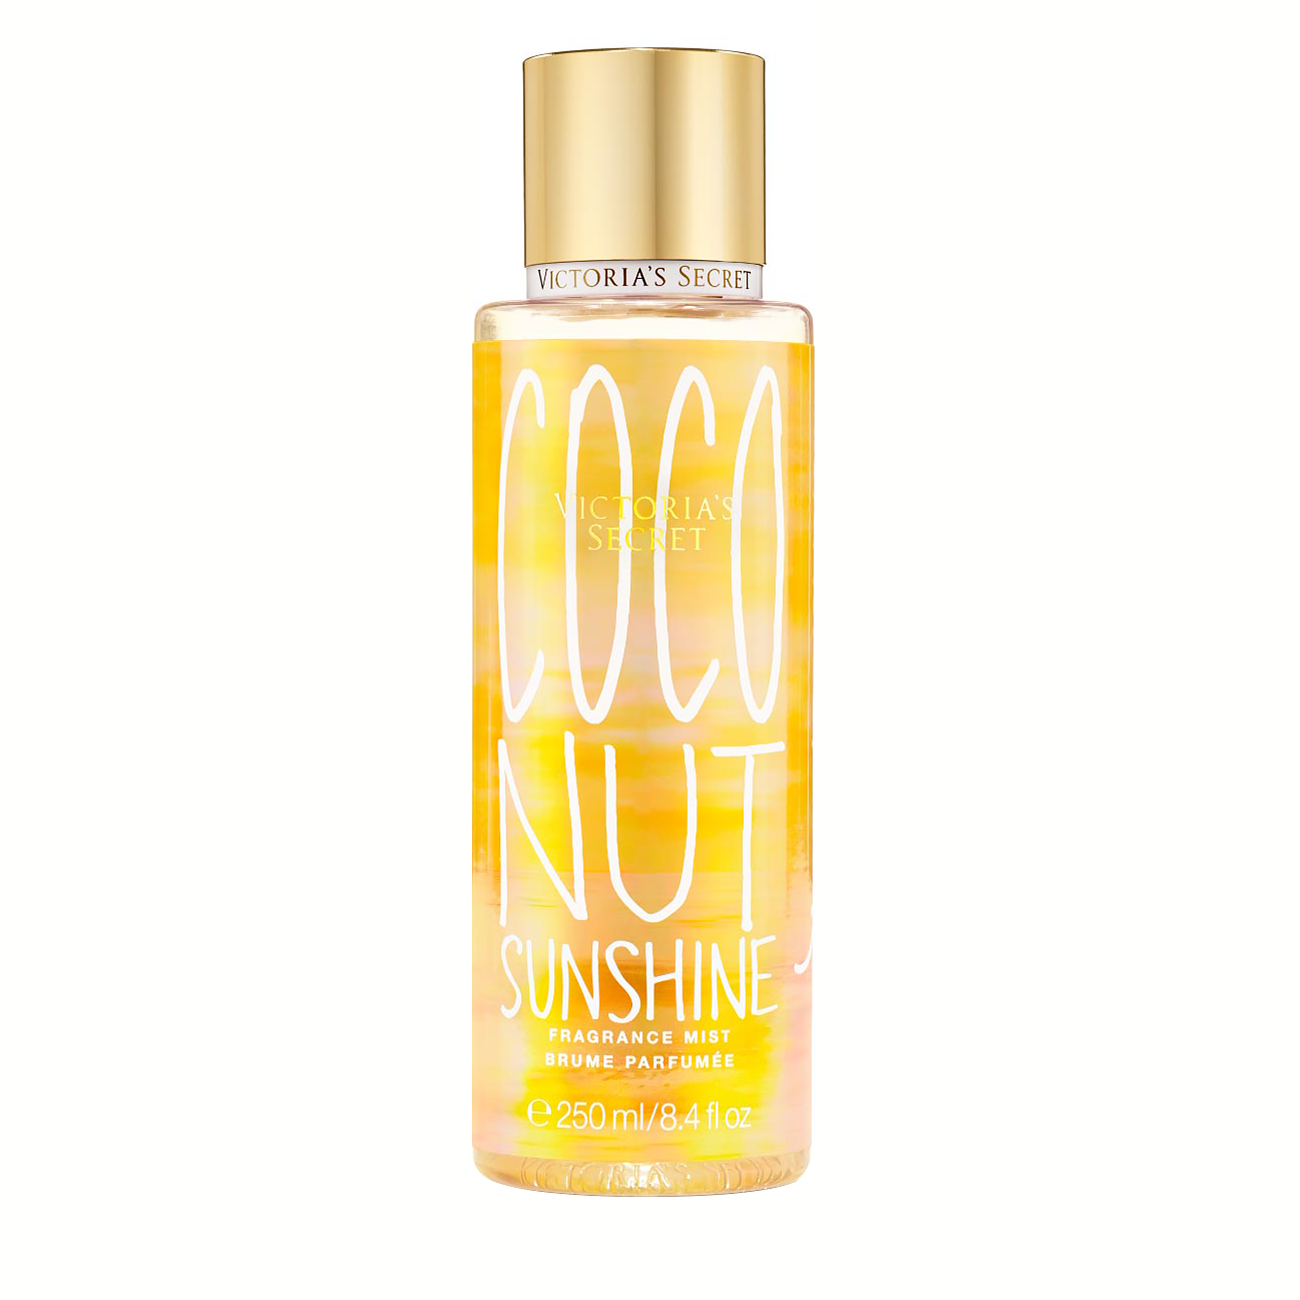 Coconut Sunshine Mist 250ml Victoria's Secret imagine 2021 bestvalue.eu